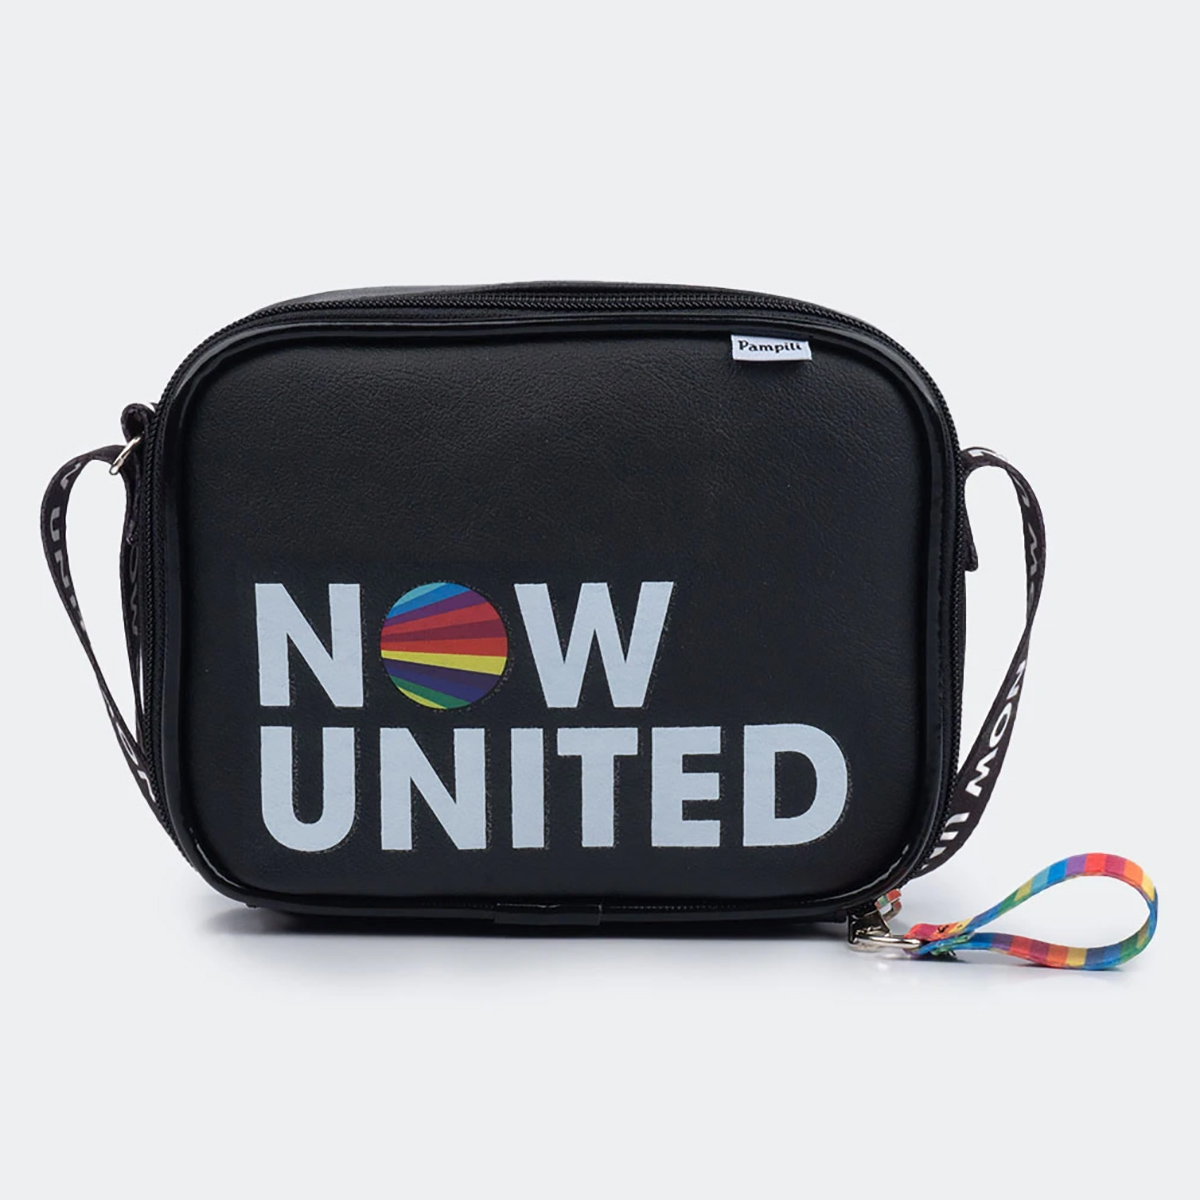 Bolsa Pampili Now United Mini Bag Preta